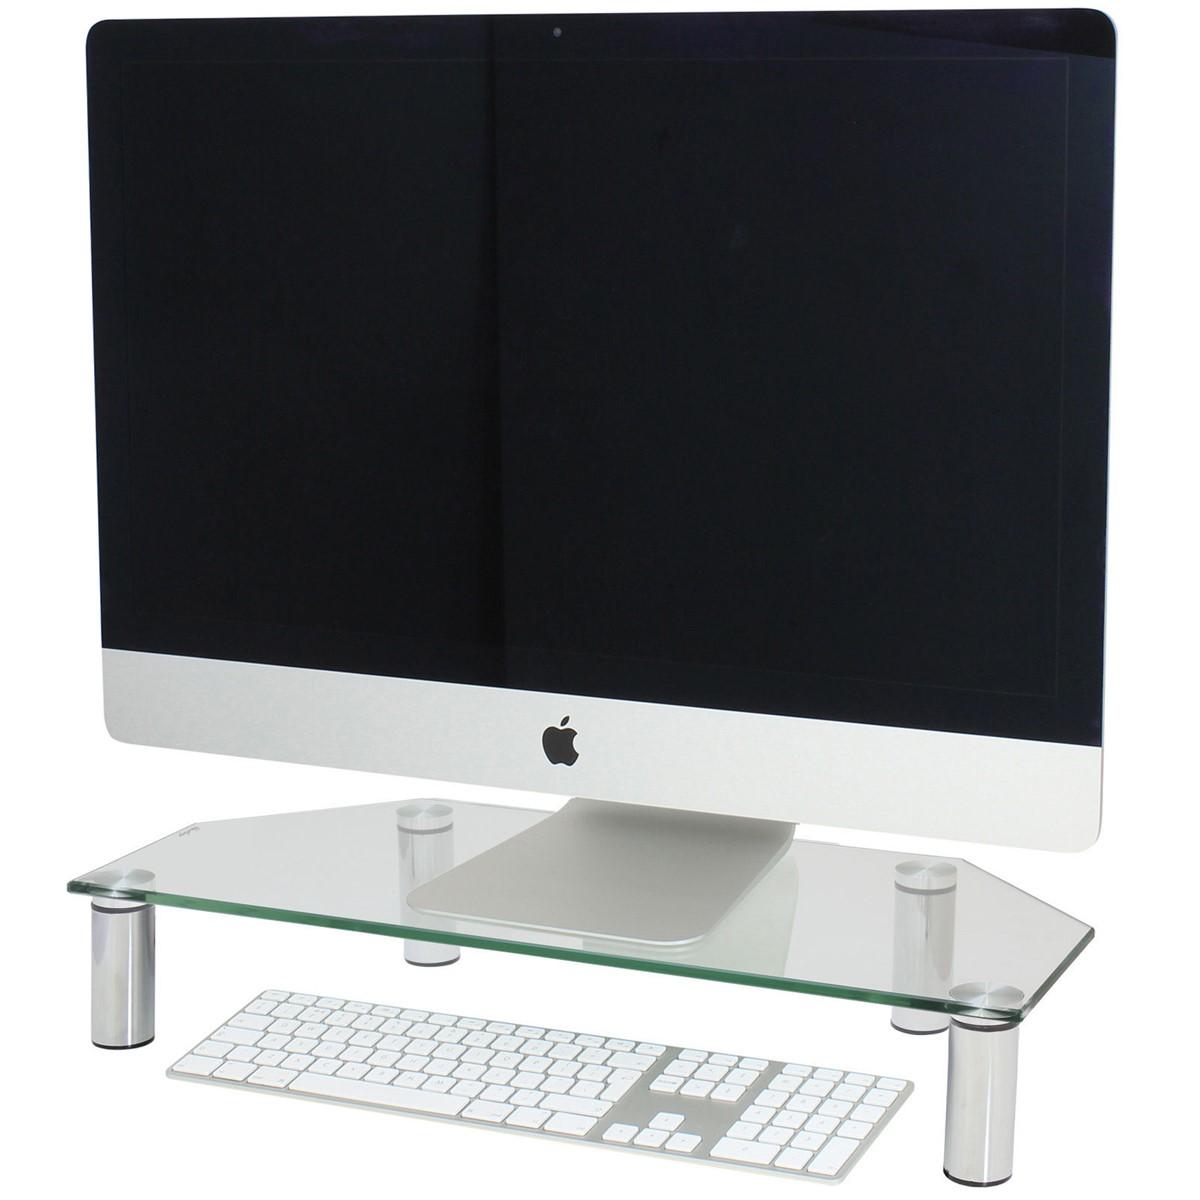 Completely new CORNER MONITOR/TV SCREEN RISER SHELF for COMPUTER/IMAC & XBOX/PS4  NJ13